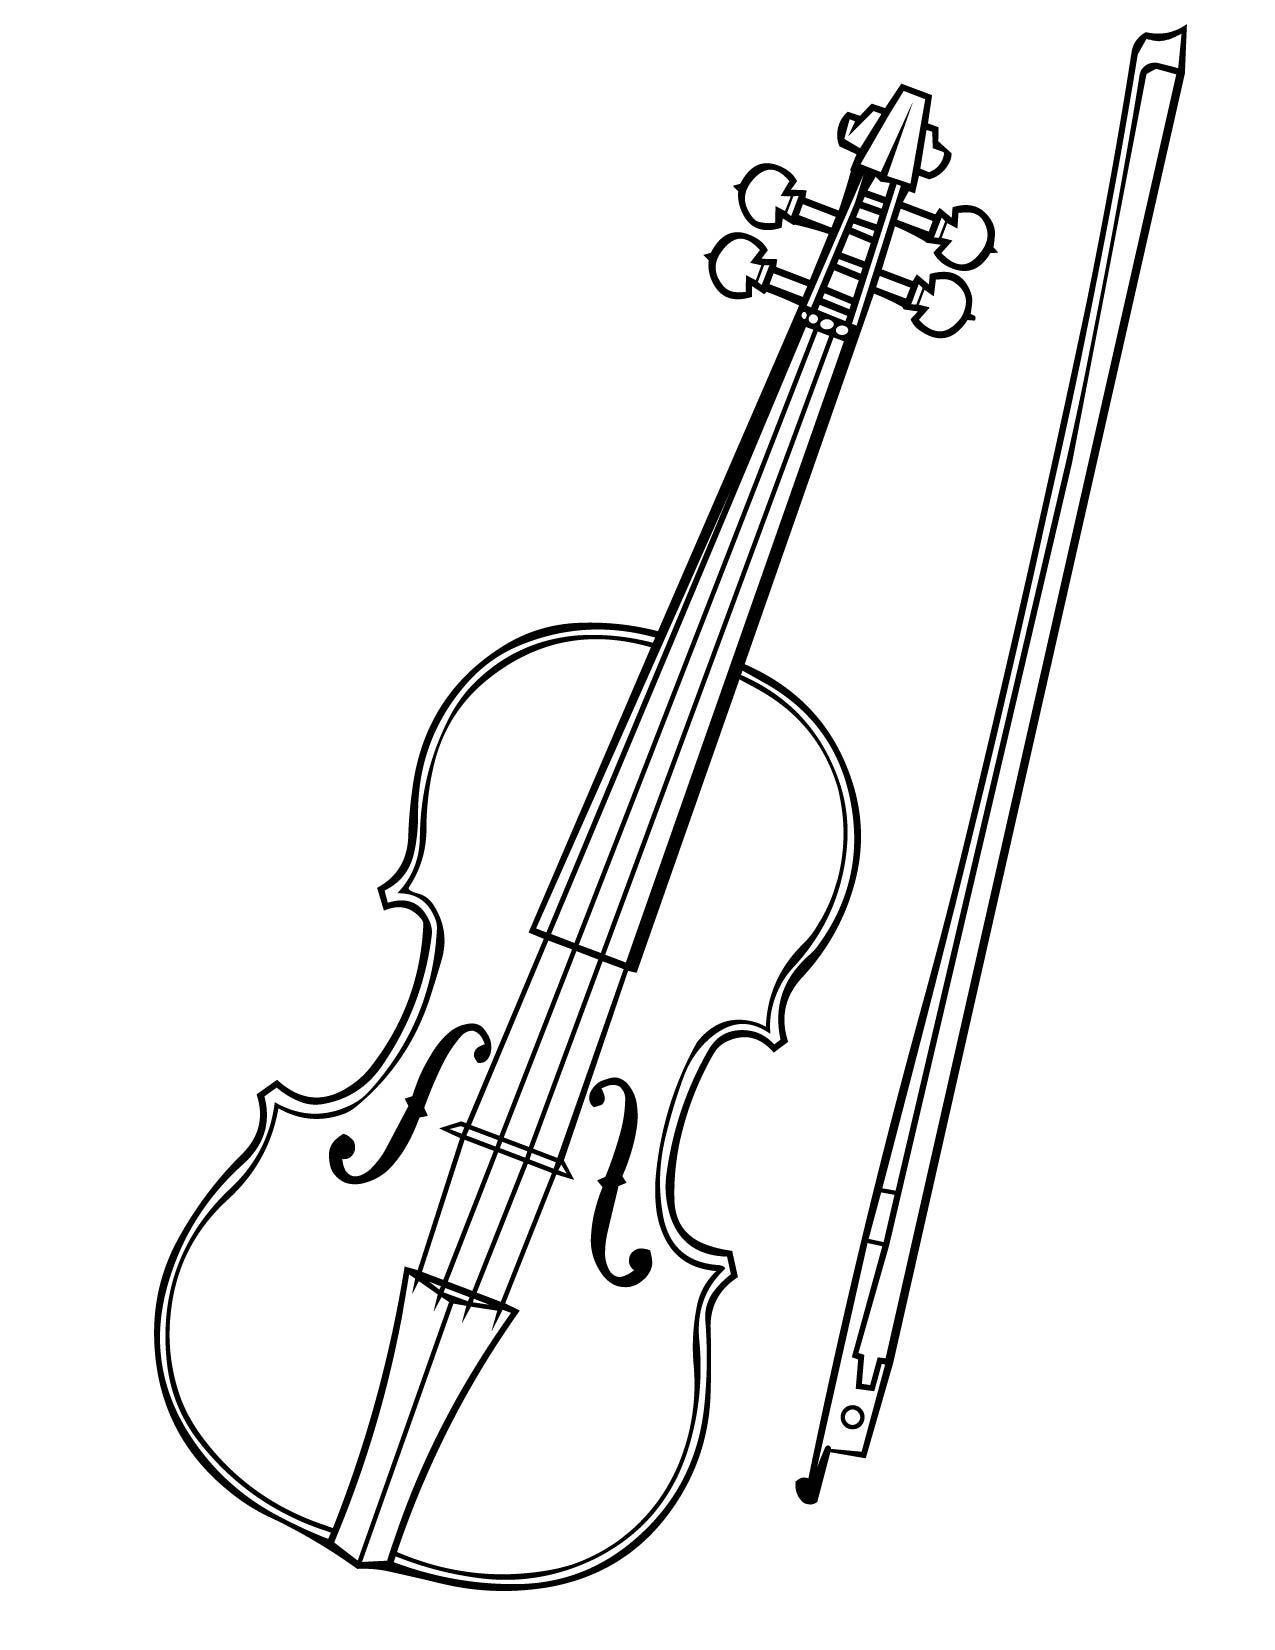 Violin Violino Ideias De Artesanato Para Casa Desenhos